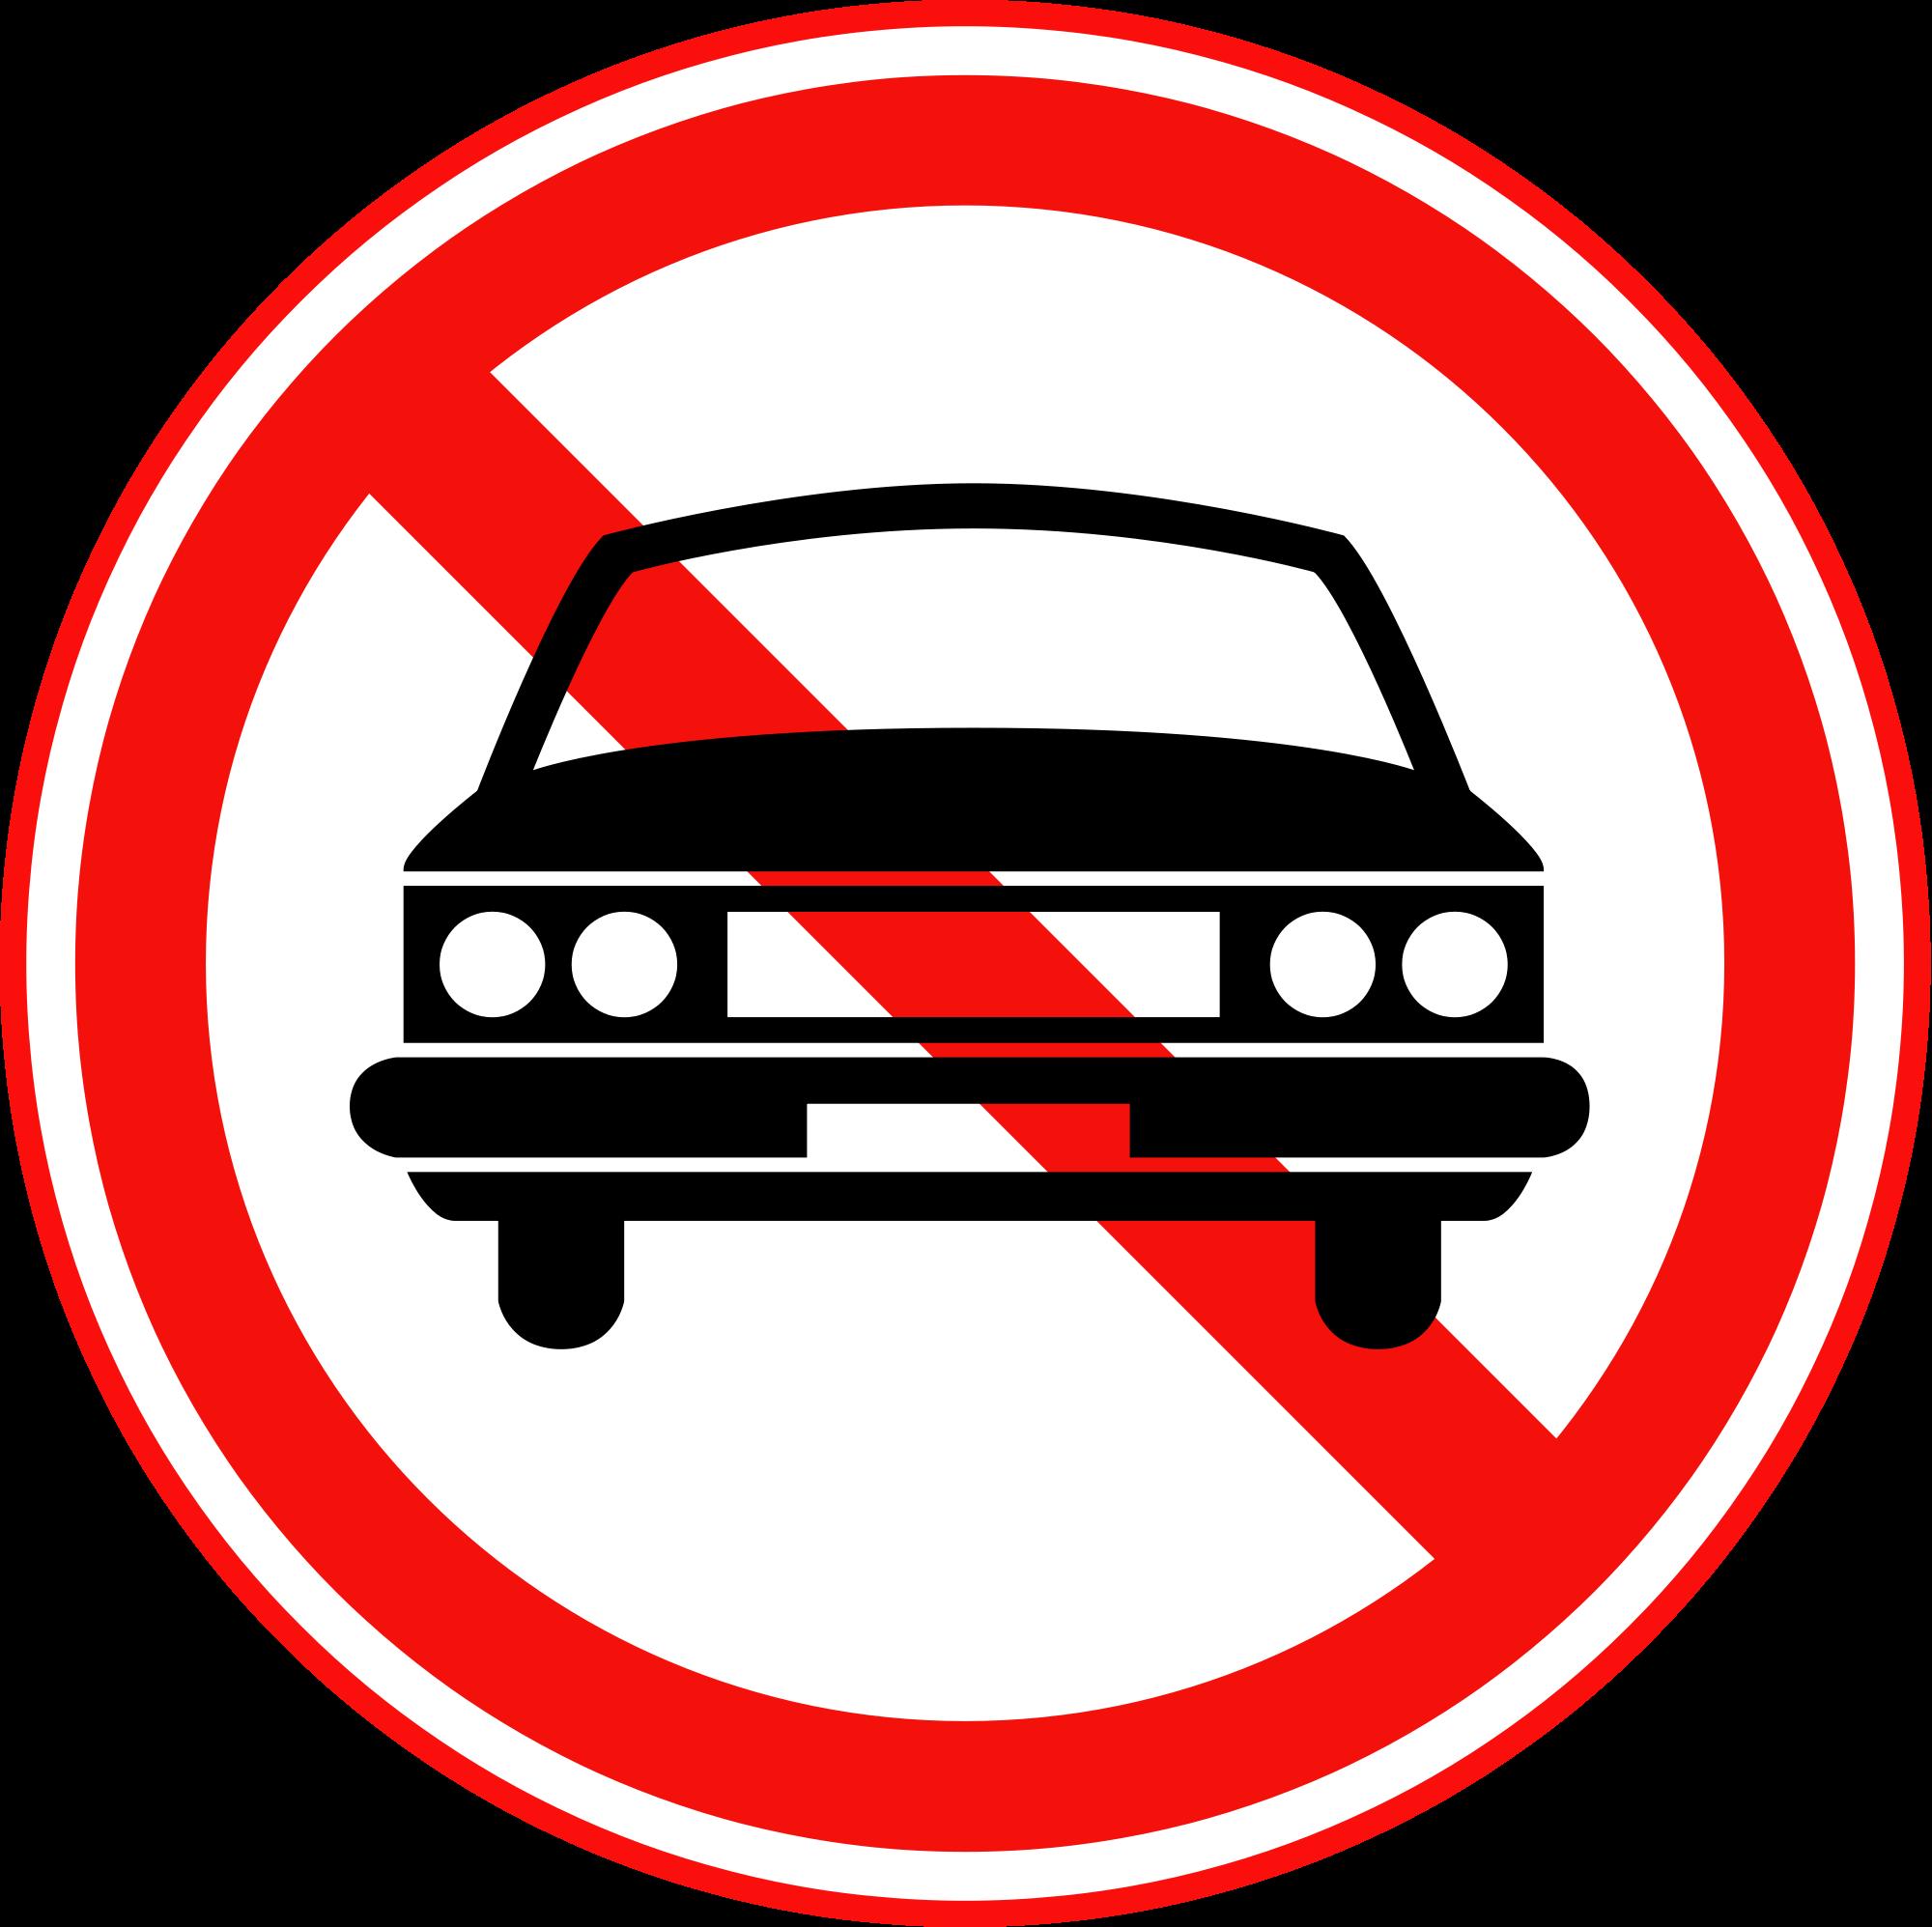 File:Korean Traffic sign (No Thoroughfare for Vehicles).svg.